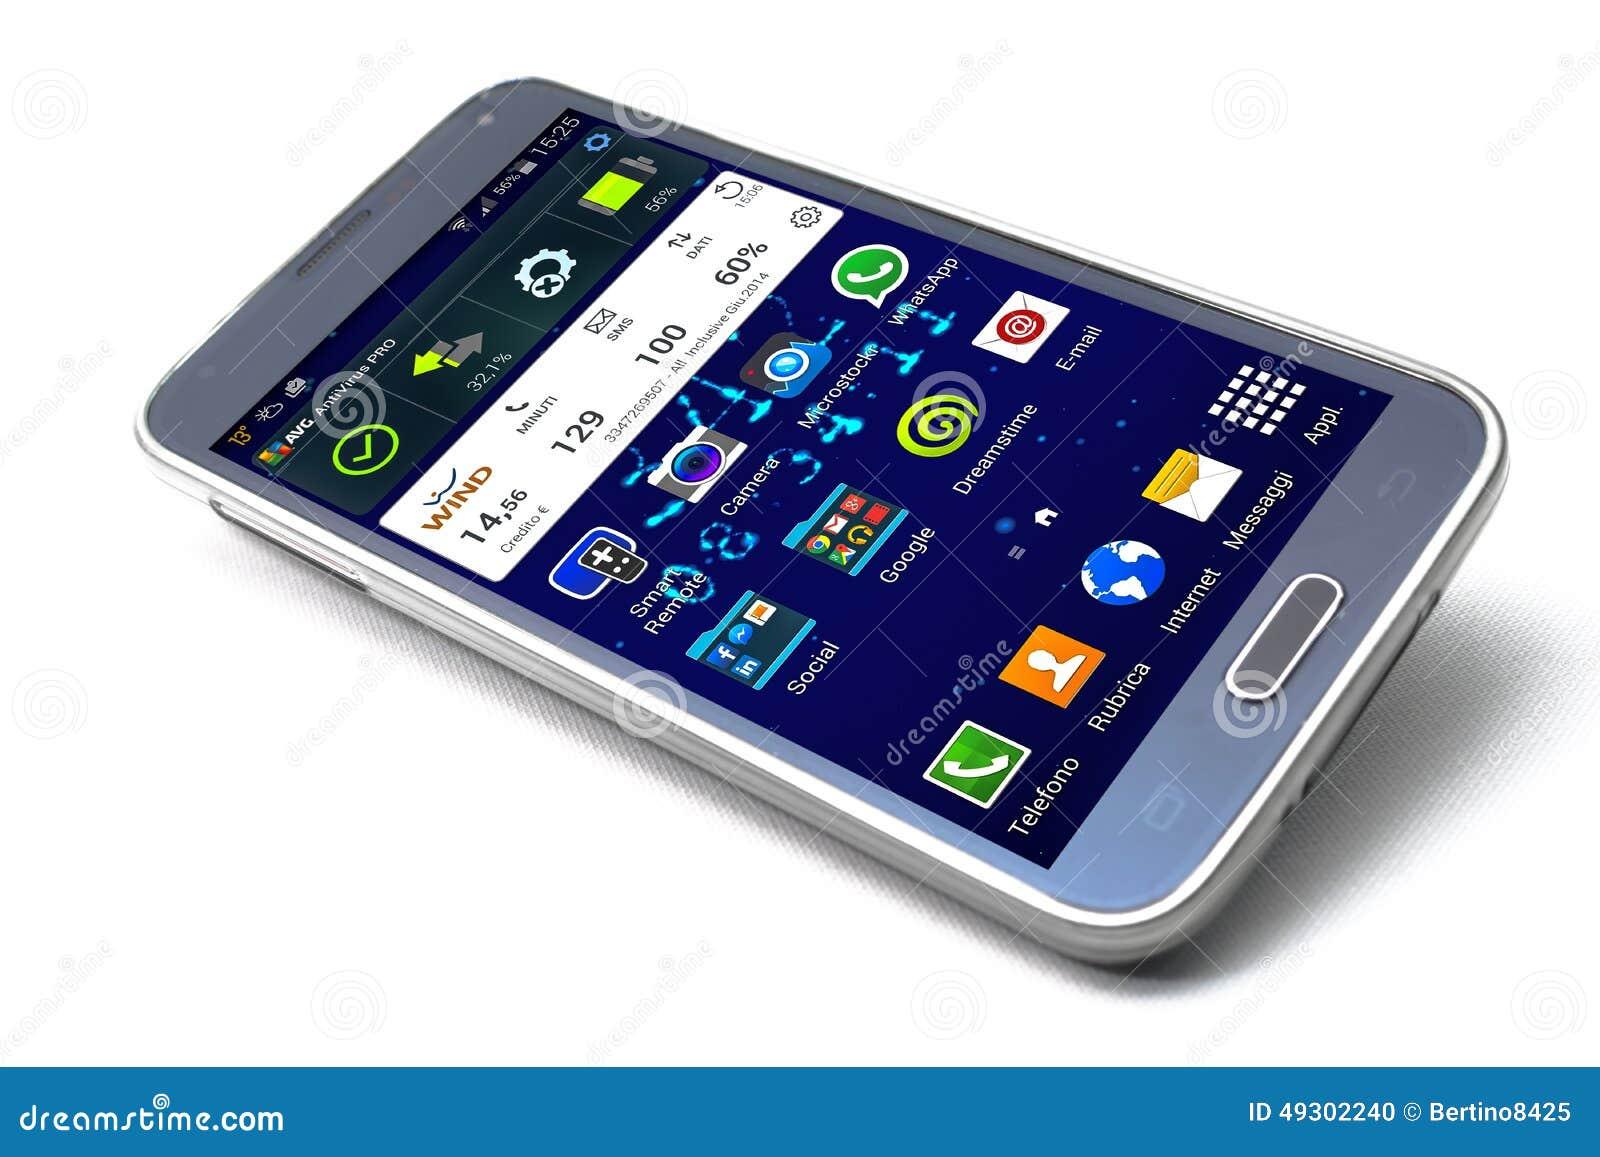 smartphone samsung galaxy s5 editorial image image 49302240. Black Bedroom Furniture Sets. Home Design Ideas